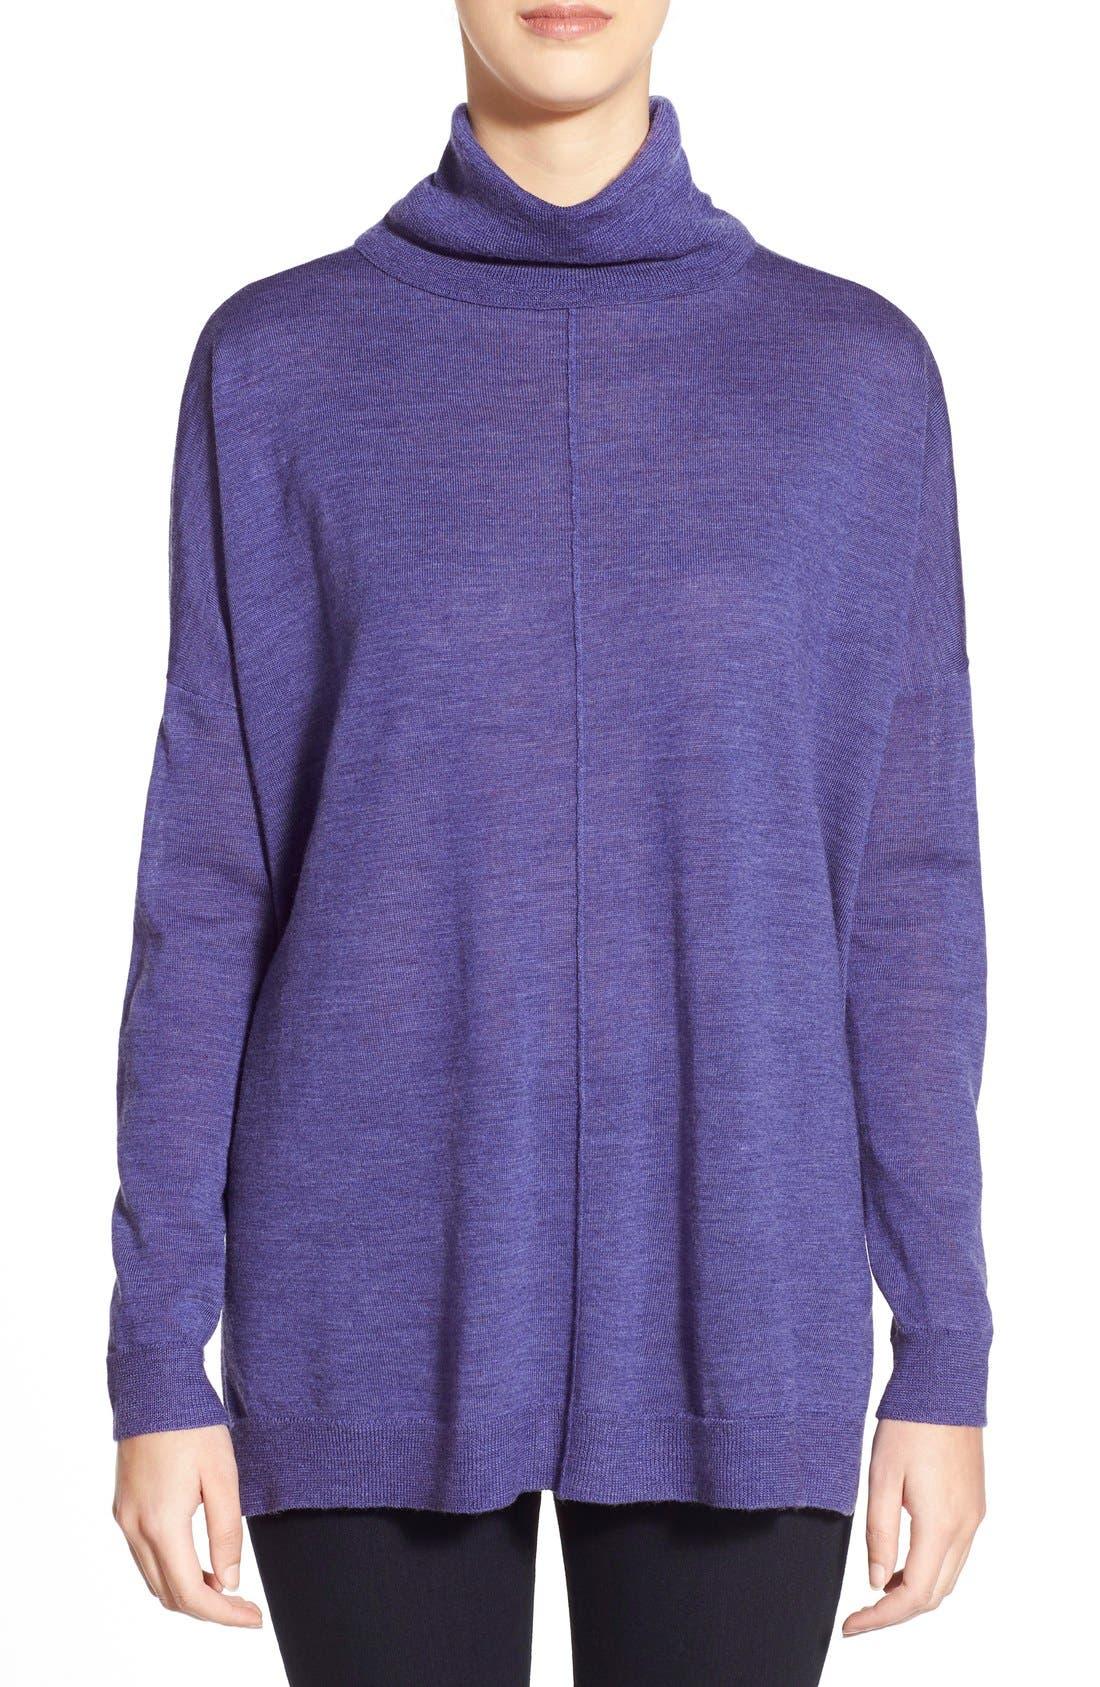 Alternate Image 1 Selected - Eileen Fisher BoxyMerino Turtleneck Sweater